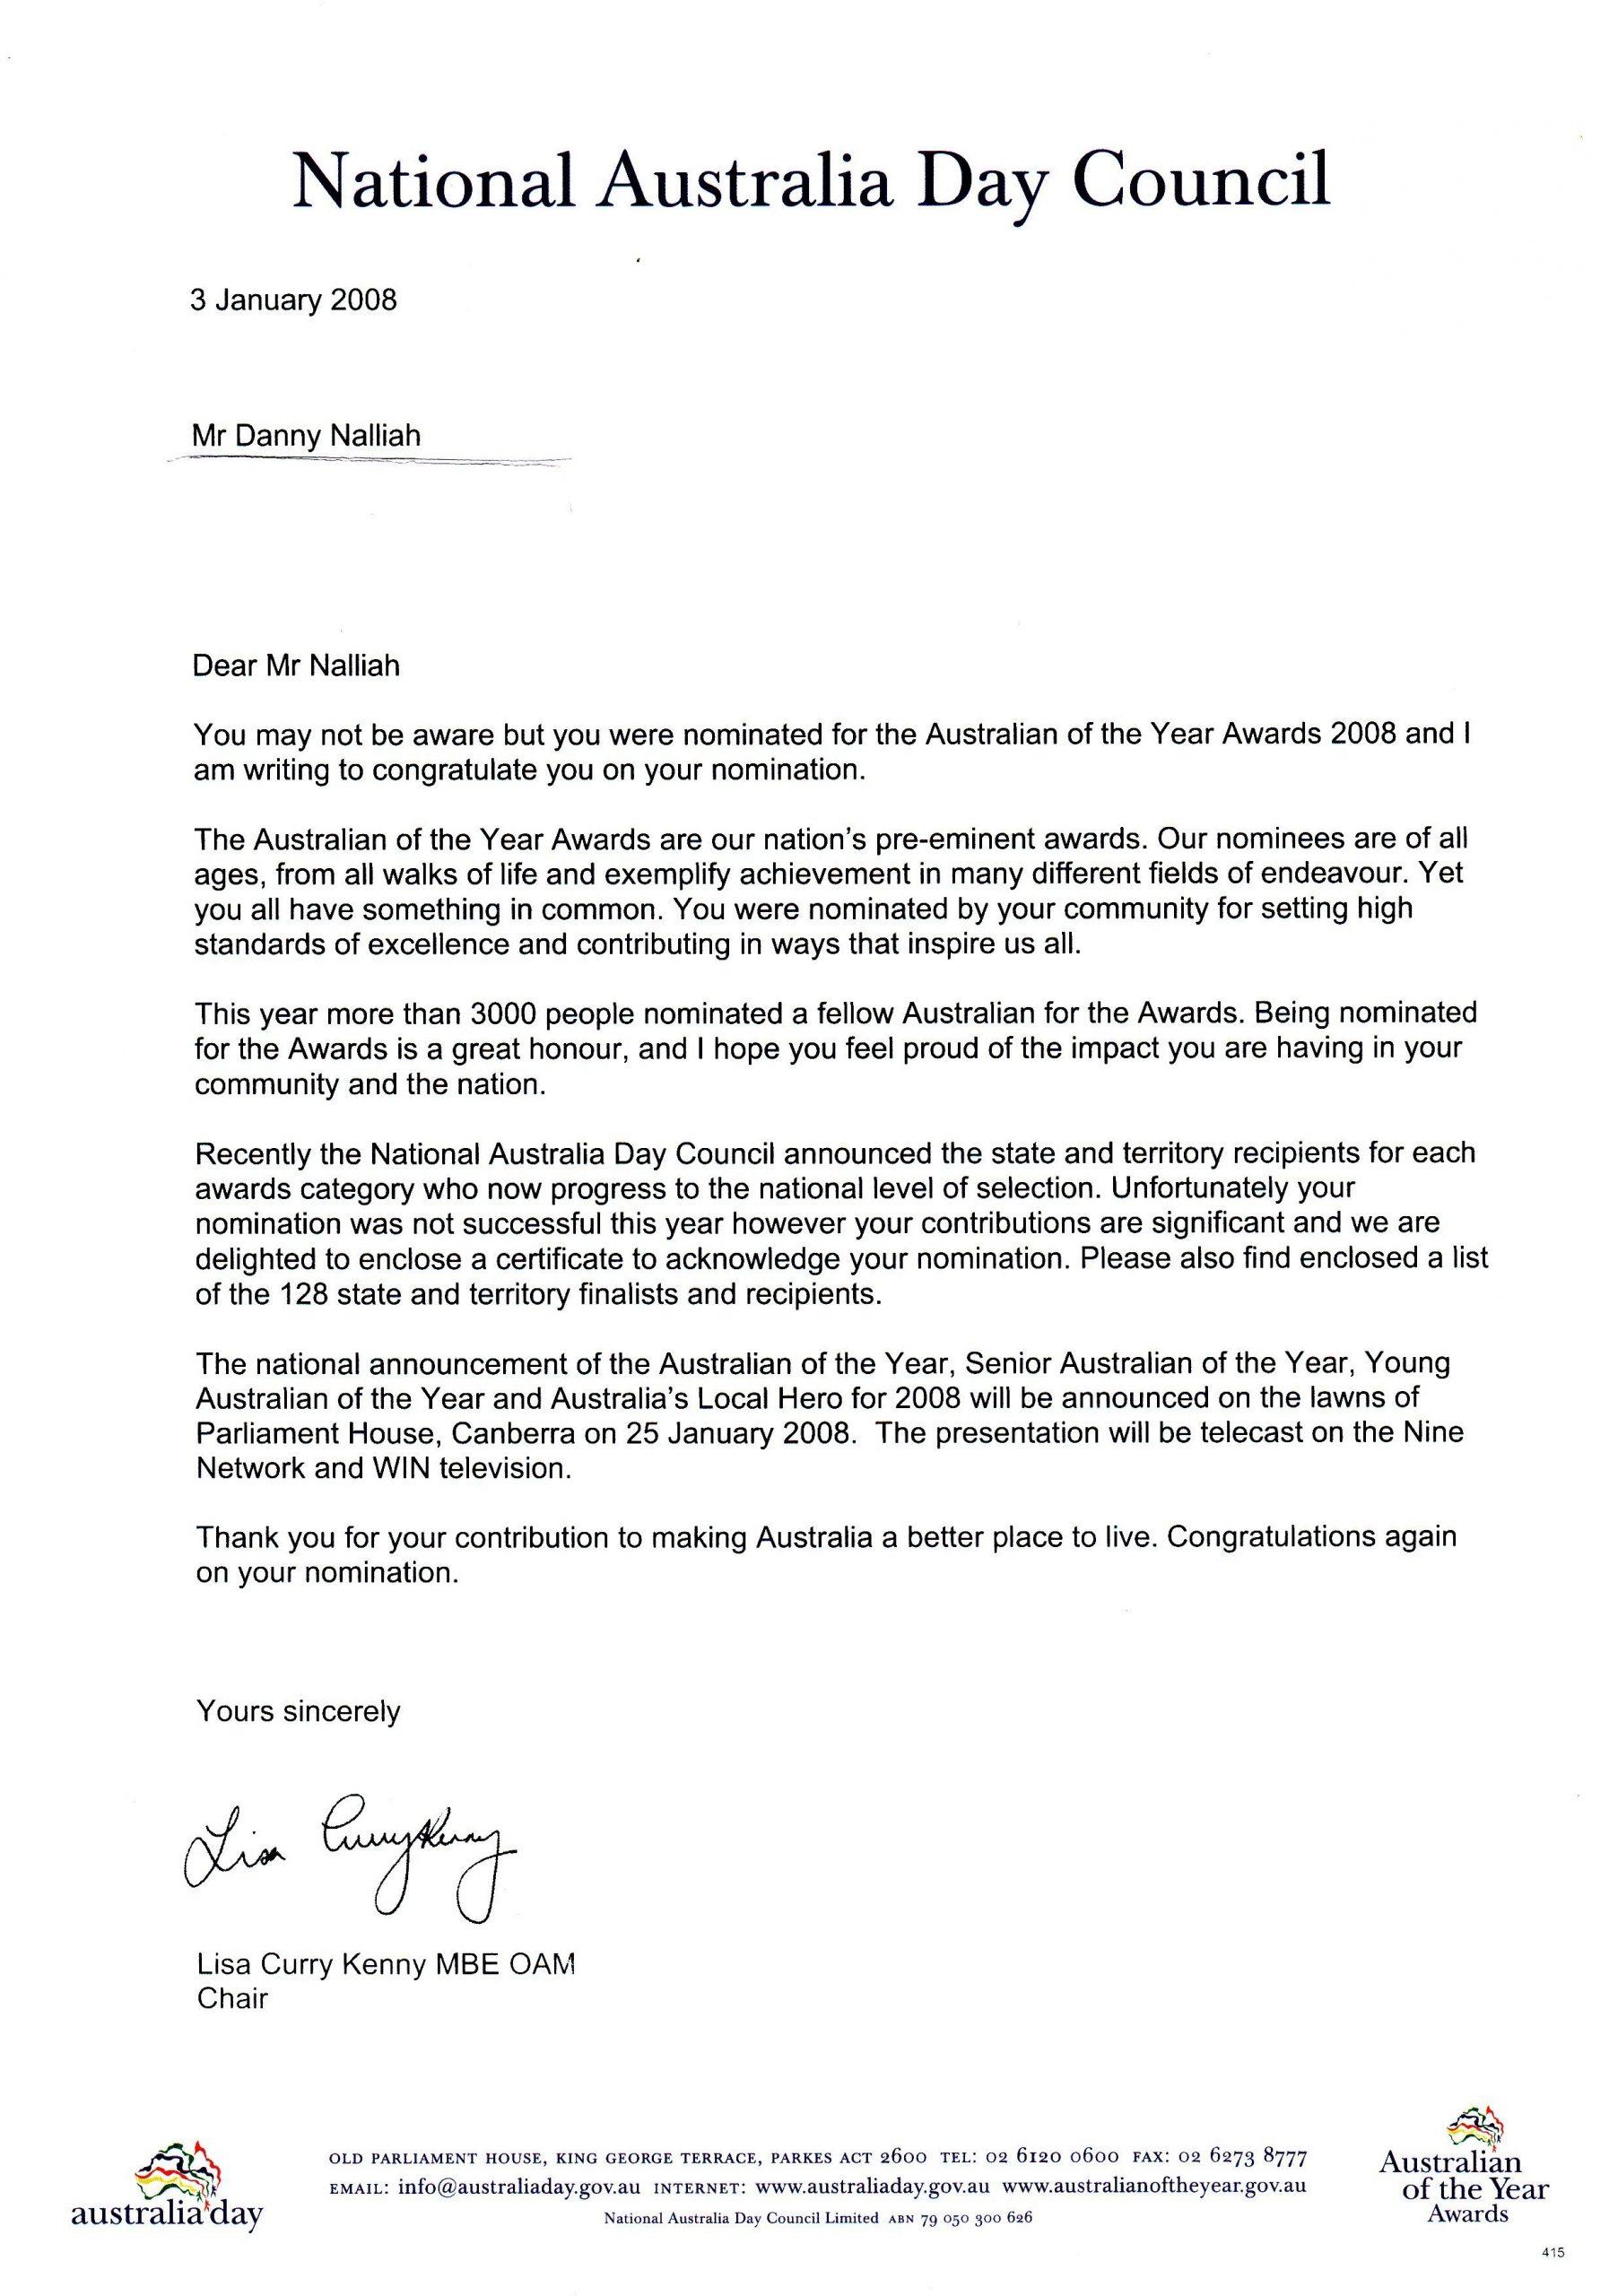 Reference Letter For Award Nomination • Invitation ...